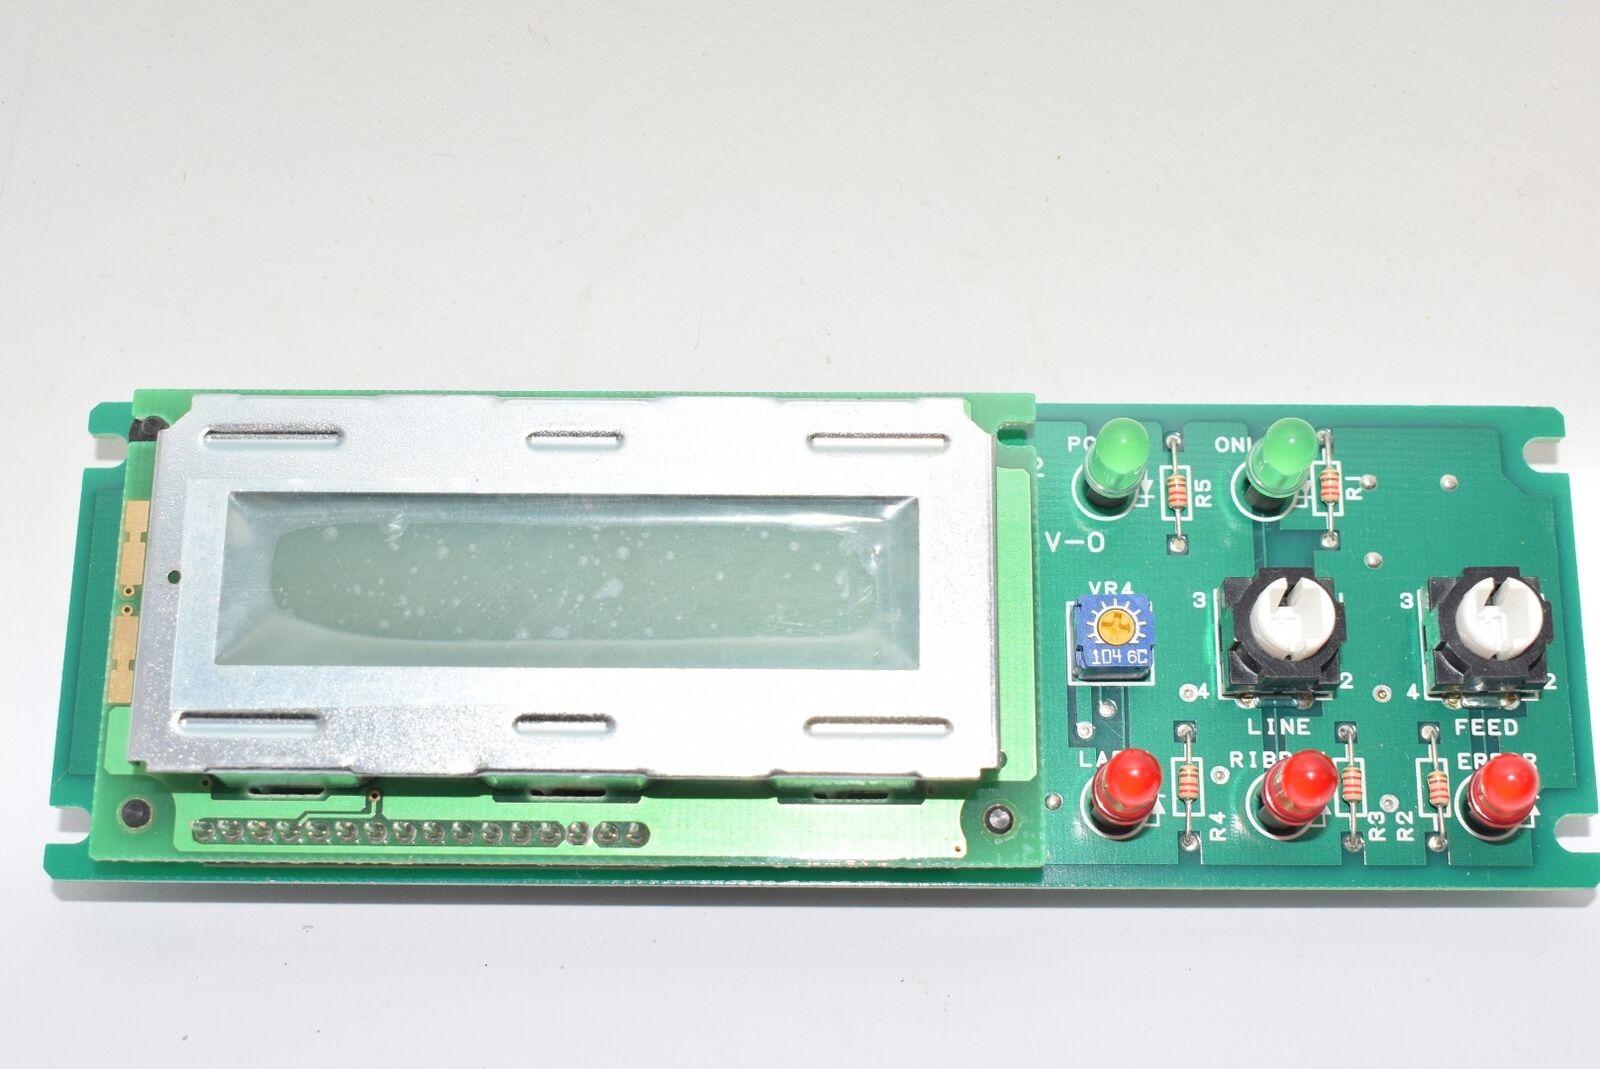 New Sato Pc Board Display Assembly M8480s Kb Ncm7301 Rev 12